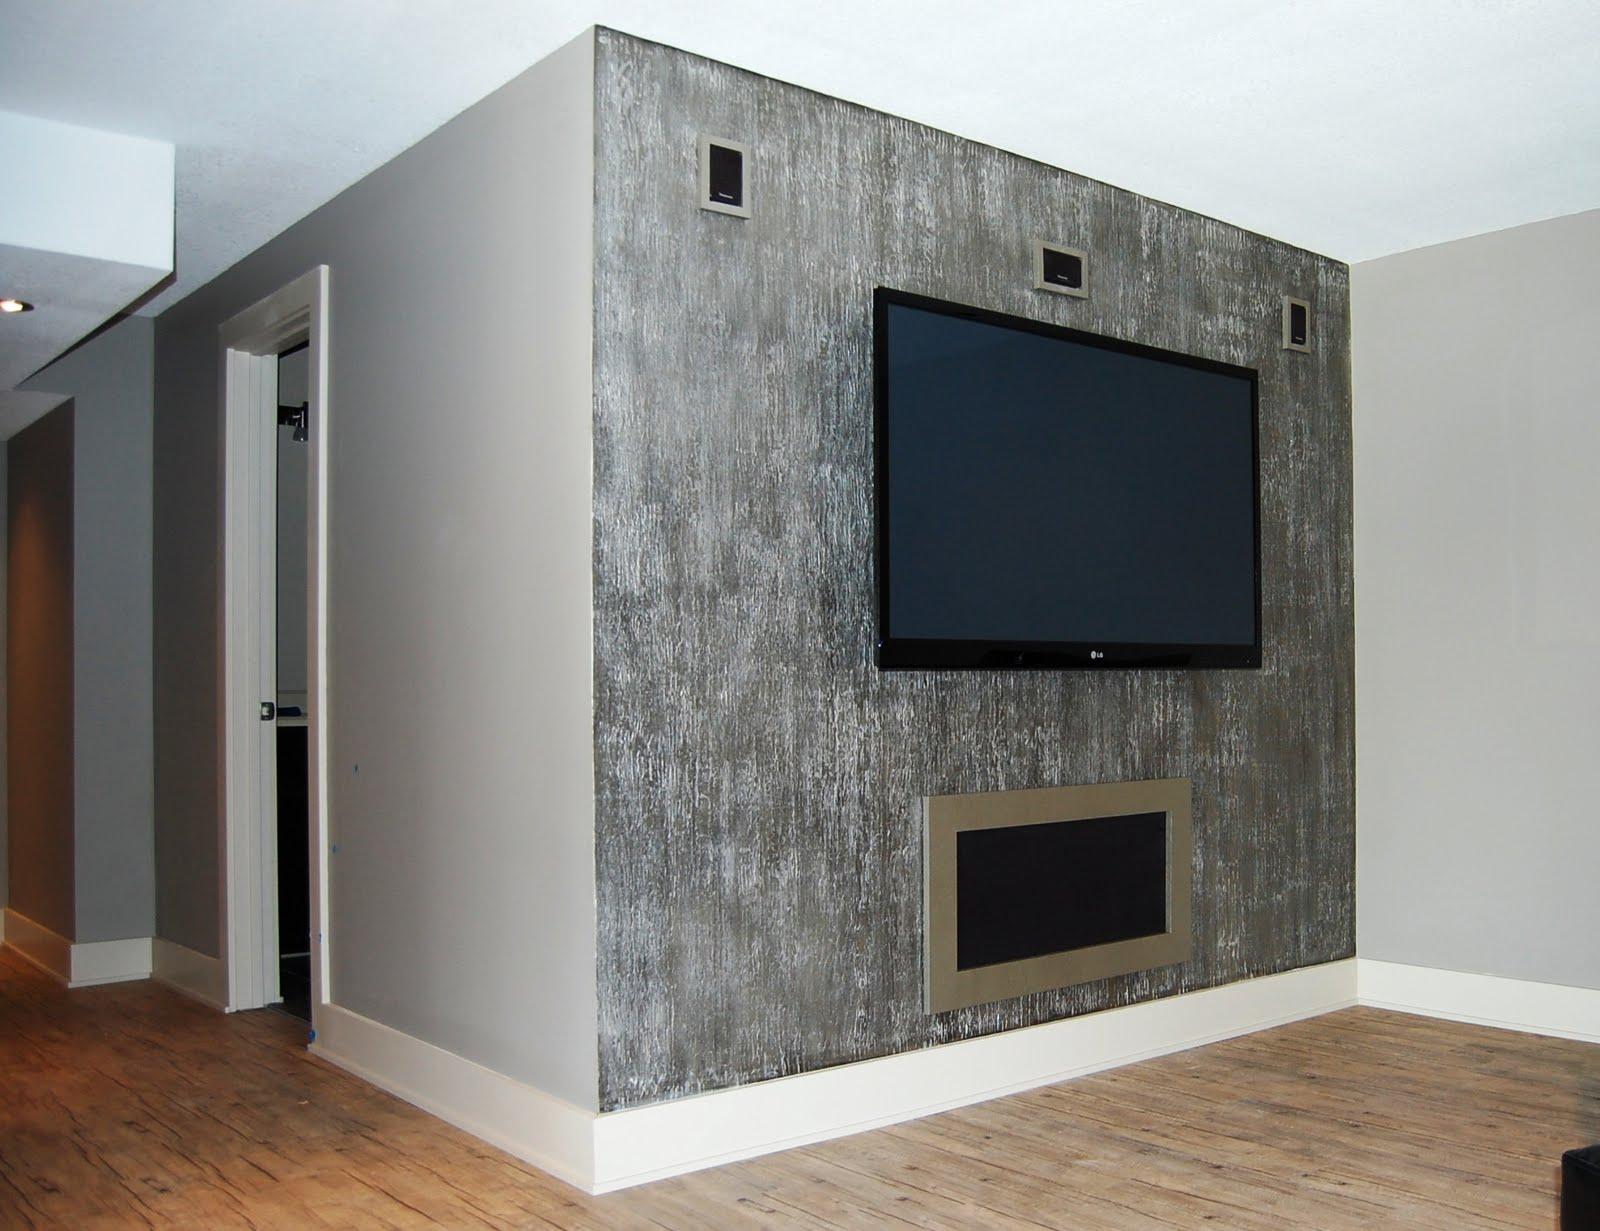 ralph lauren paints. Black Bedroom Furniture Sets. Home Design Ideas